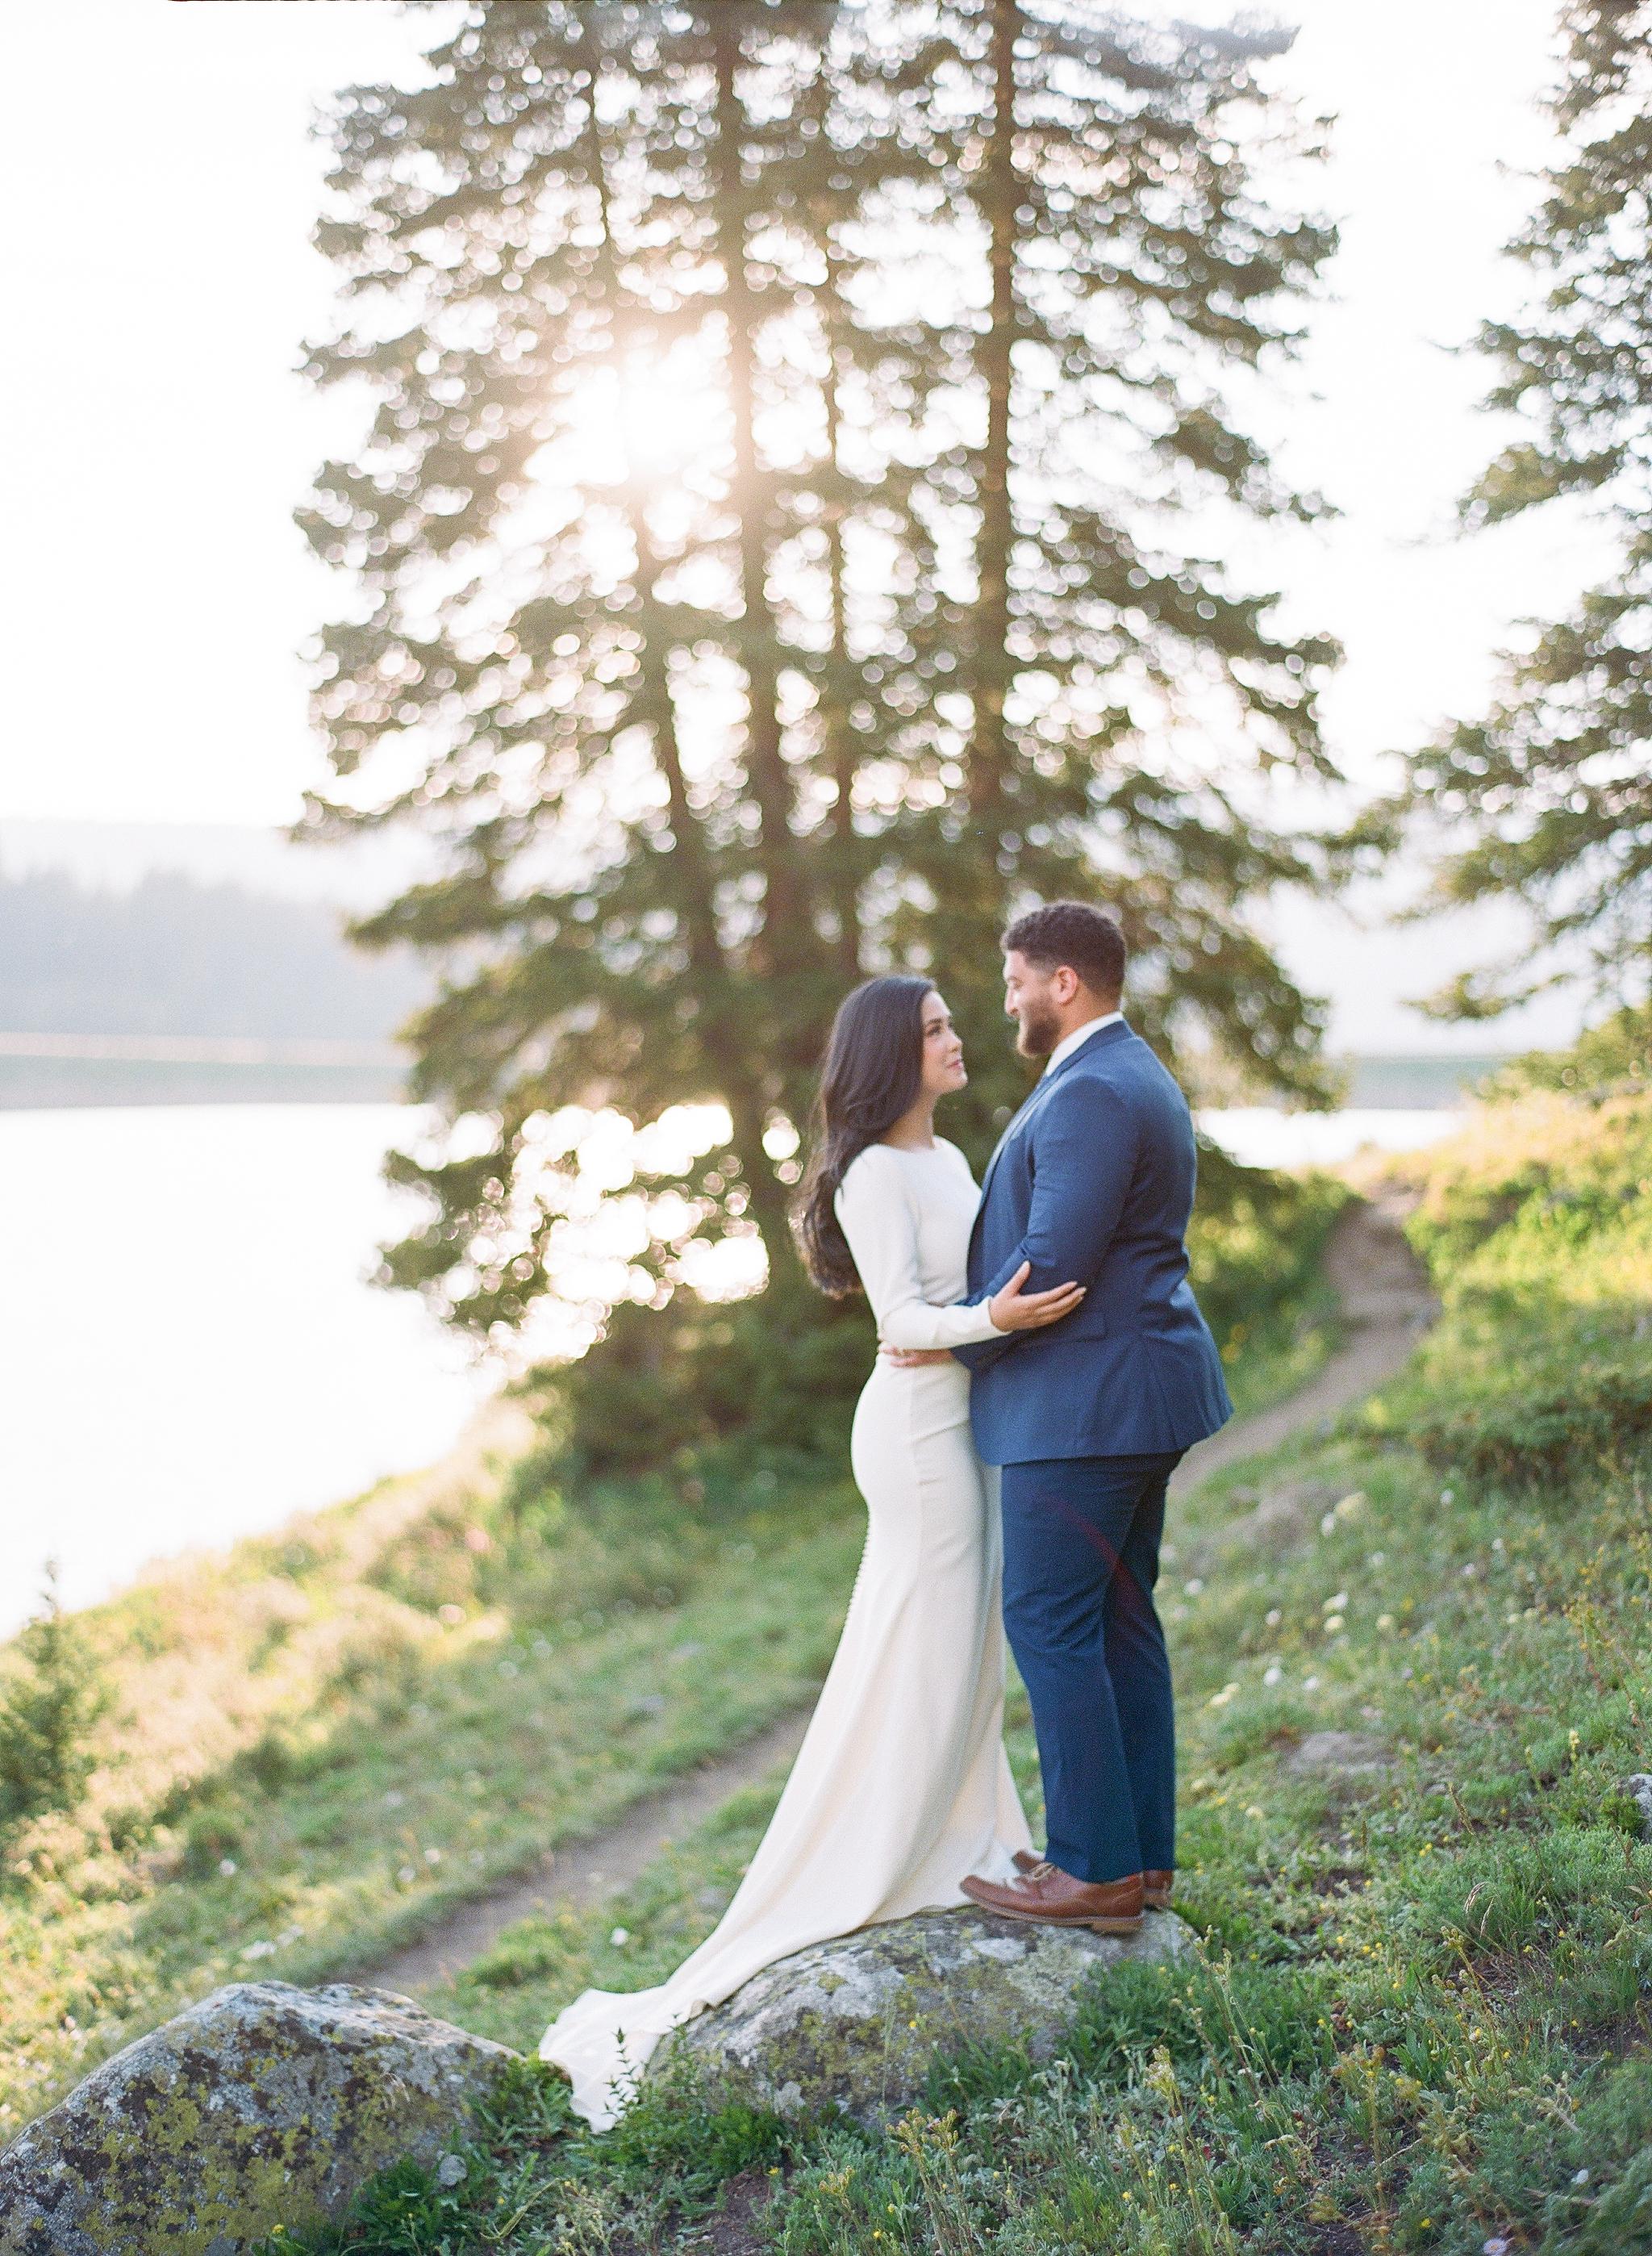 Clinton-Gulch-Reservoir-Copper-Mountain-Wedding-Elopement-Bride-and-Groom